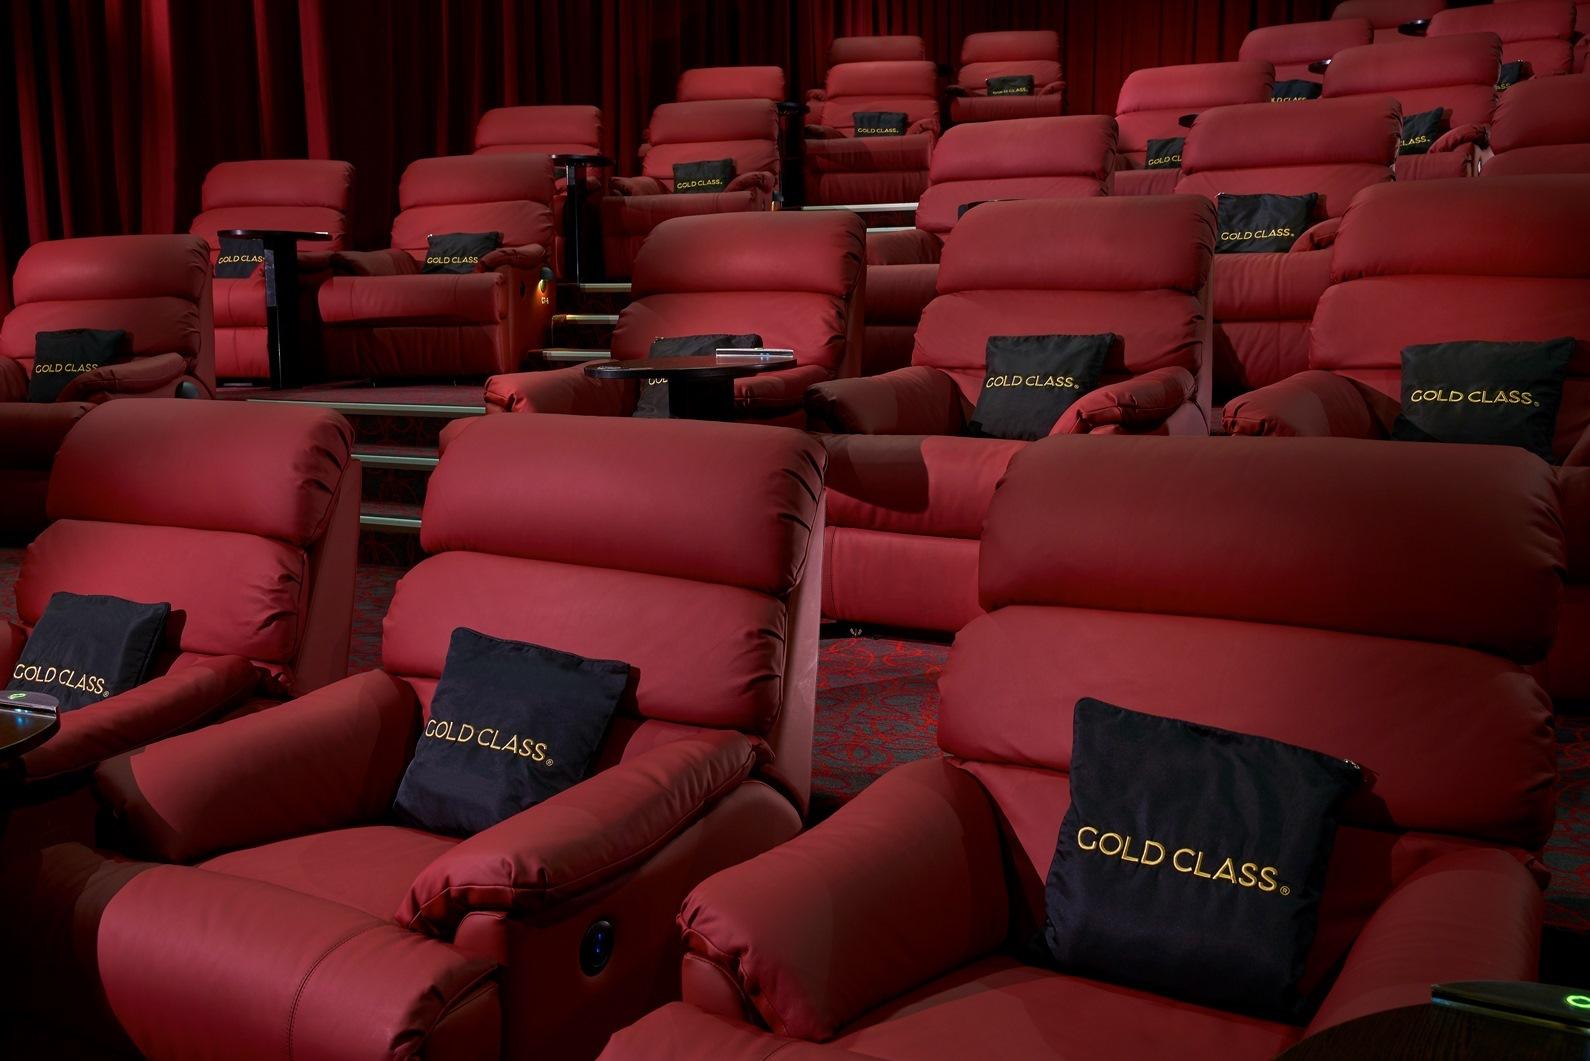 Golden Village GV Gold Class  Film in Singapore